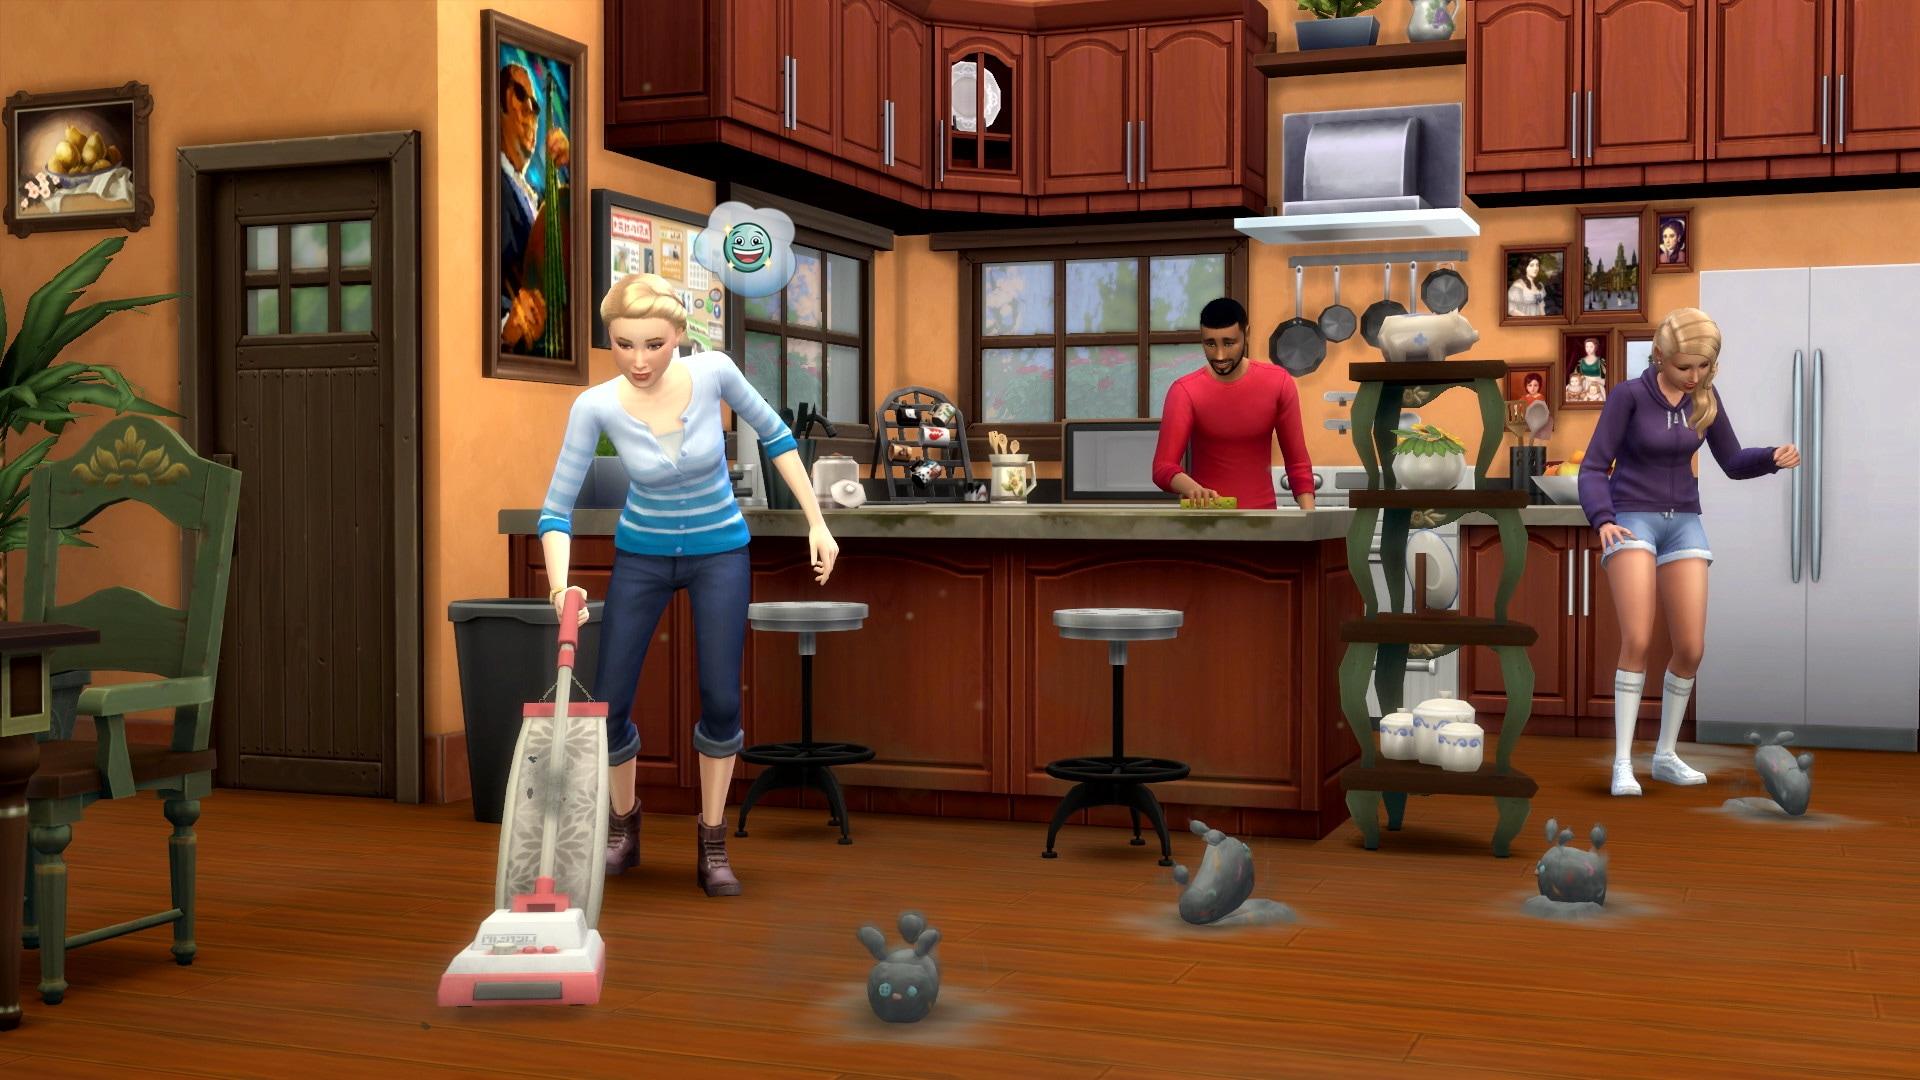 The Sims 4 Bust the Dust Kit (PC) - Origin Key - GLOBAL - 3